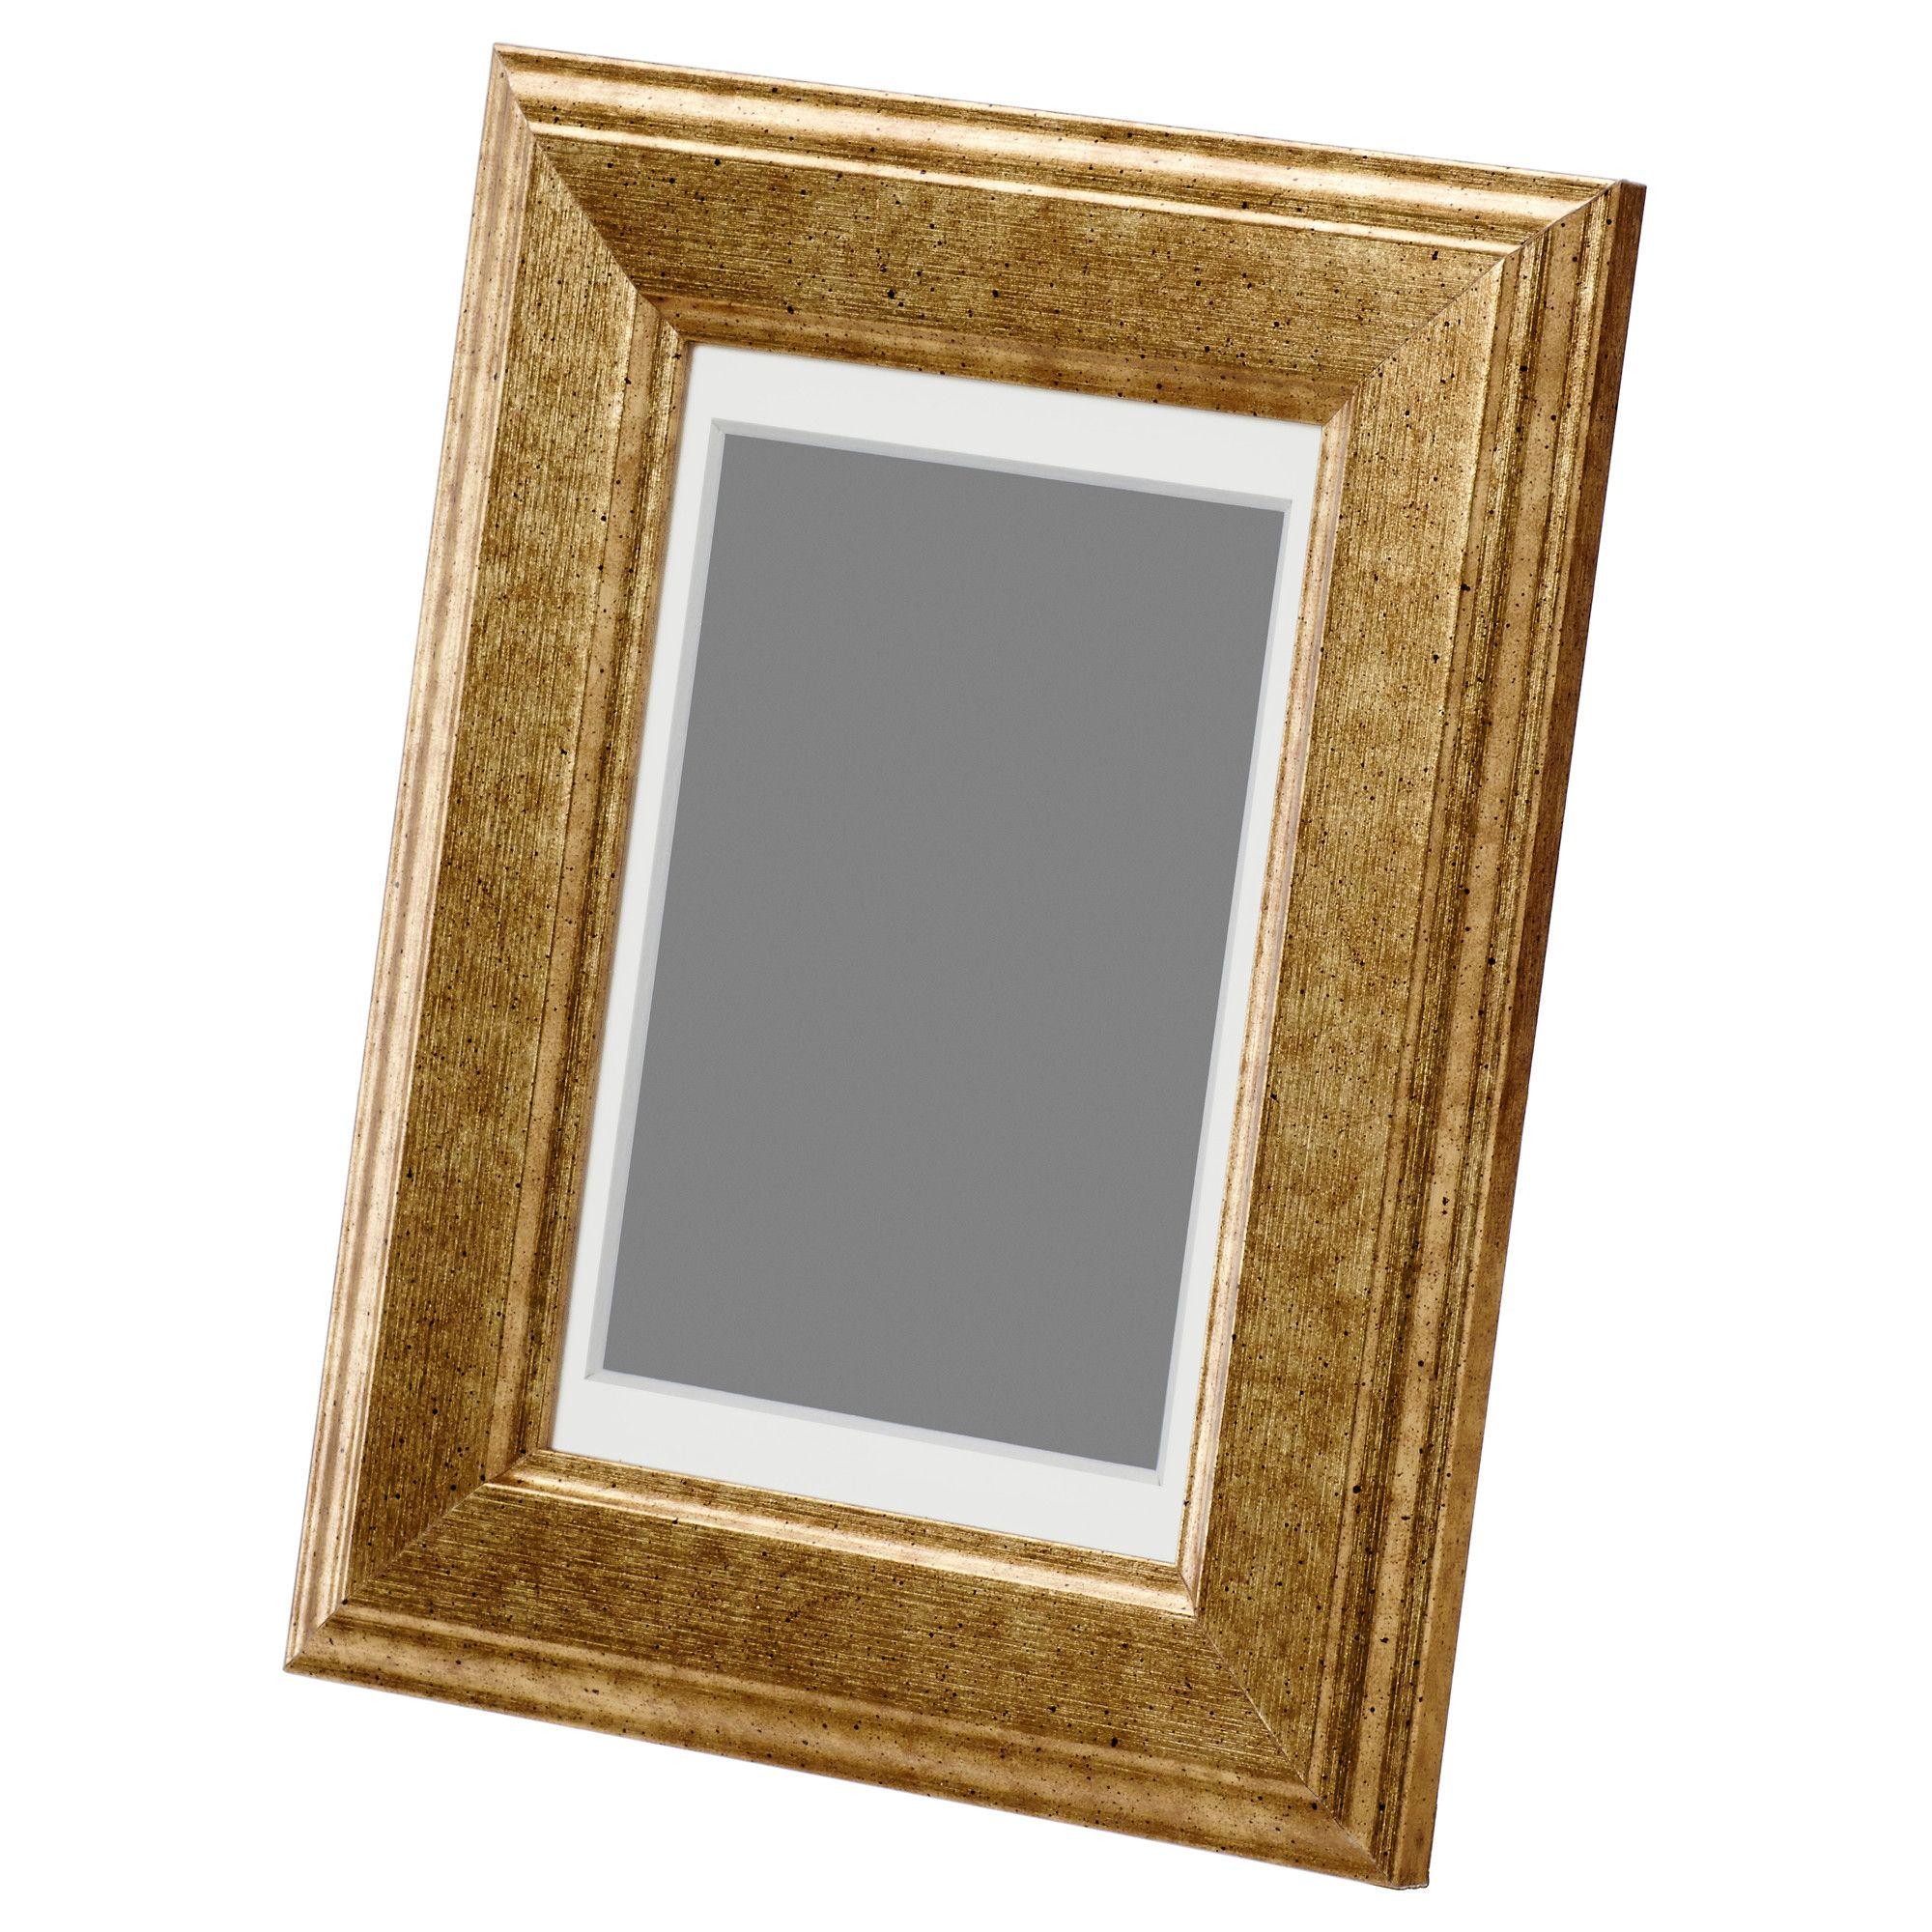 VIRSERUM Frame - gold - IKEA $3.99 4x6 | Work | Pinterest | Rahmen ...